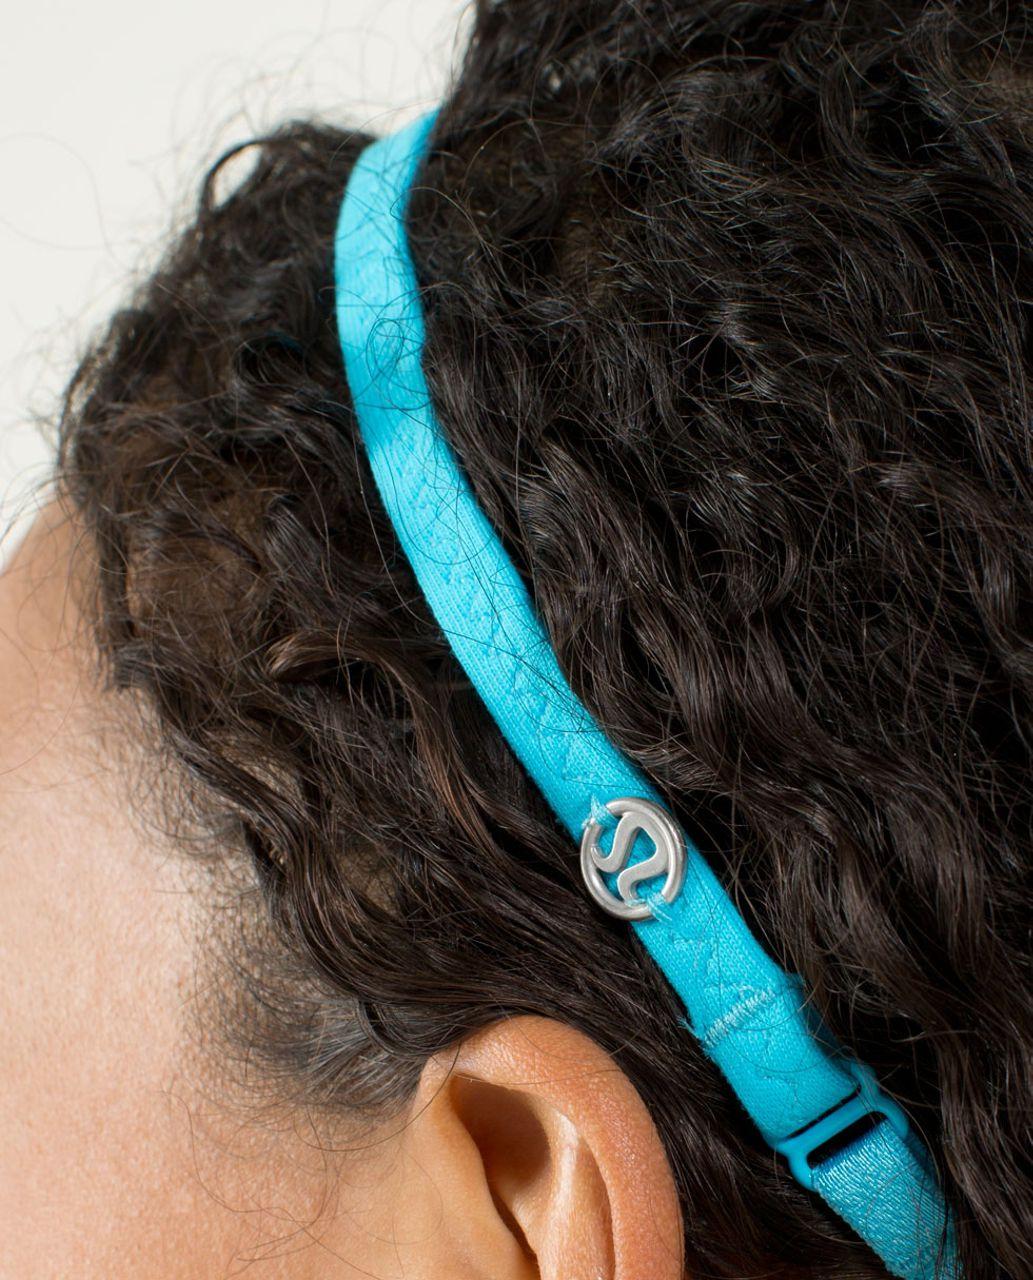 Lululemon Strappy Headband - Spry Blue